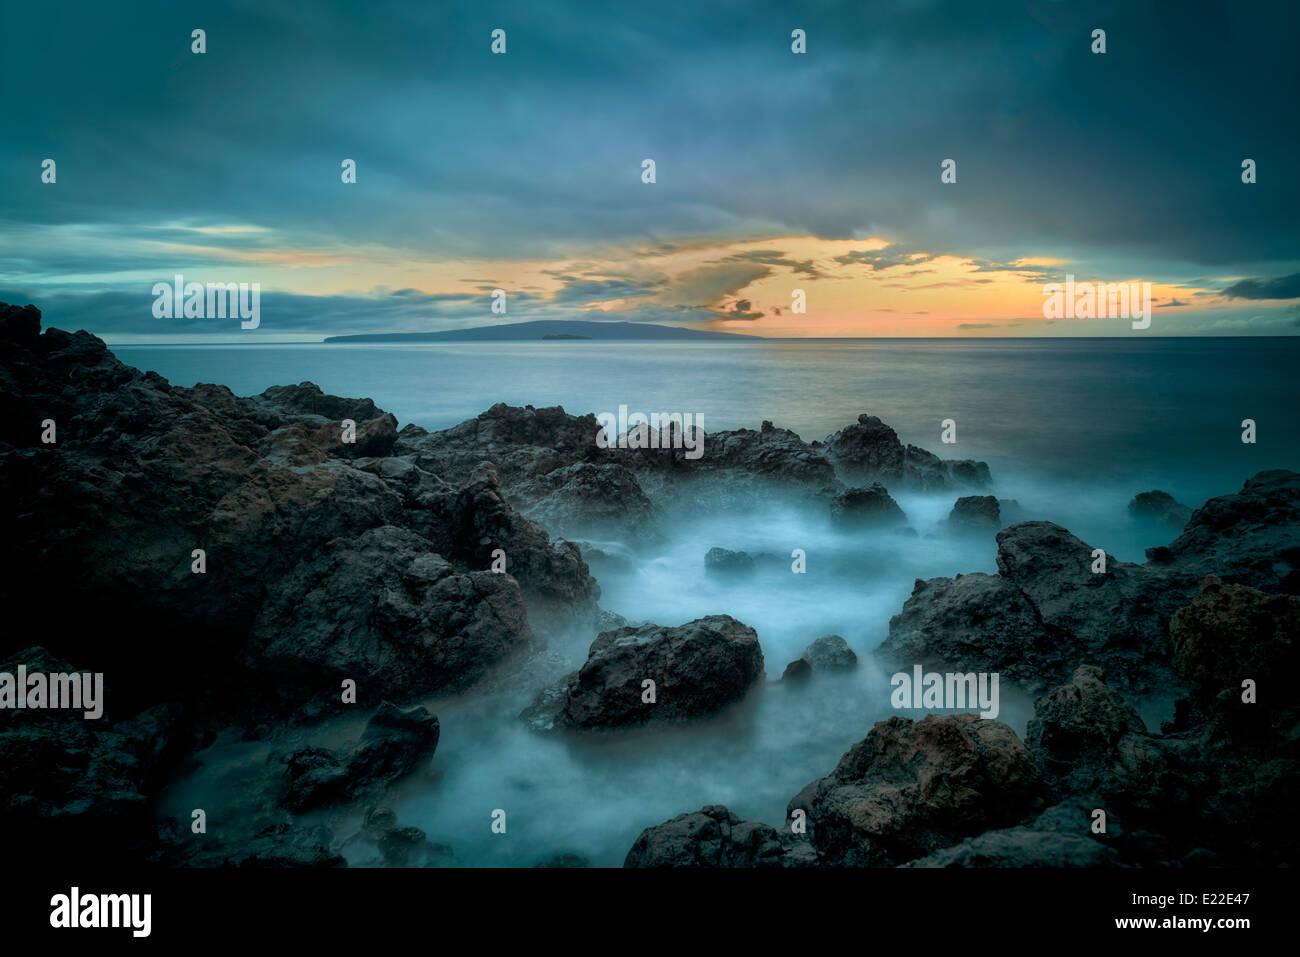 Sunset and rocky coastline. Maui, Hawaii - Stock Image